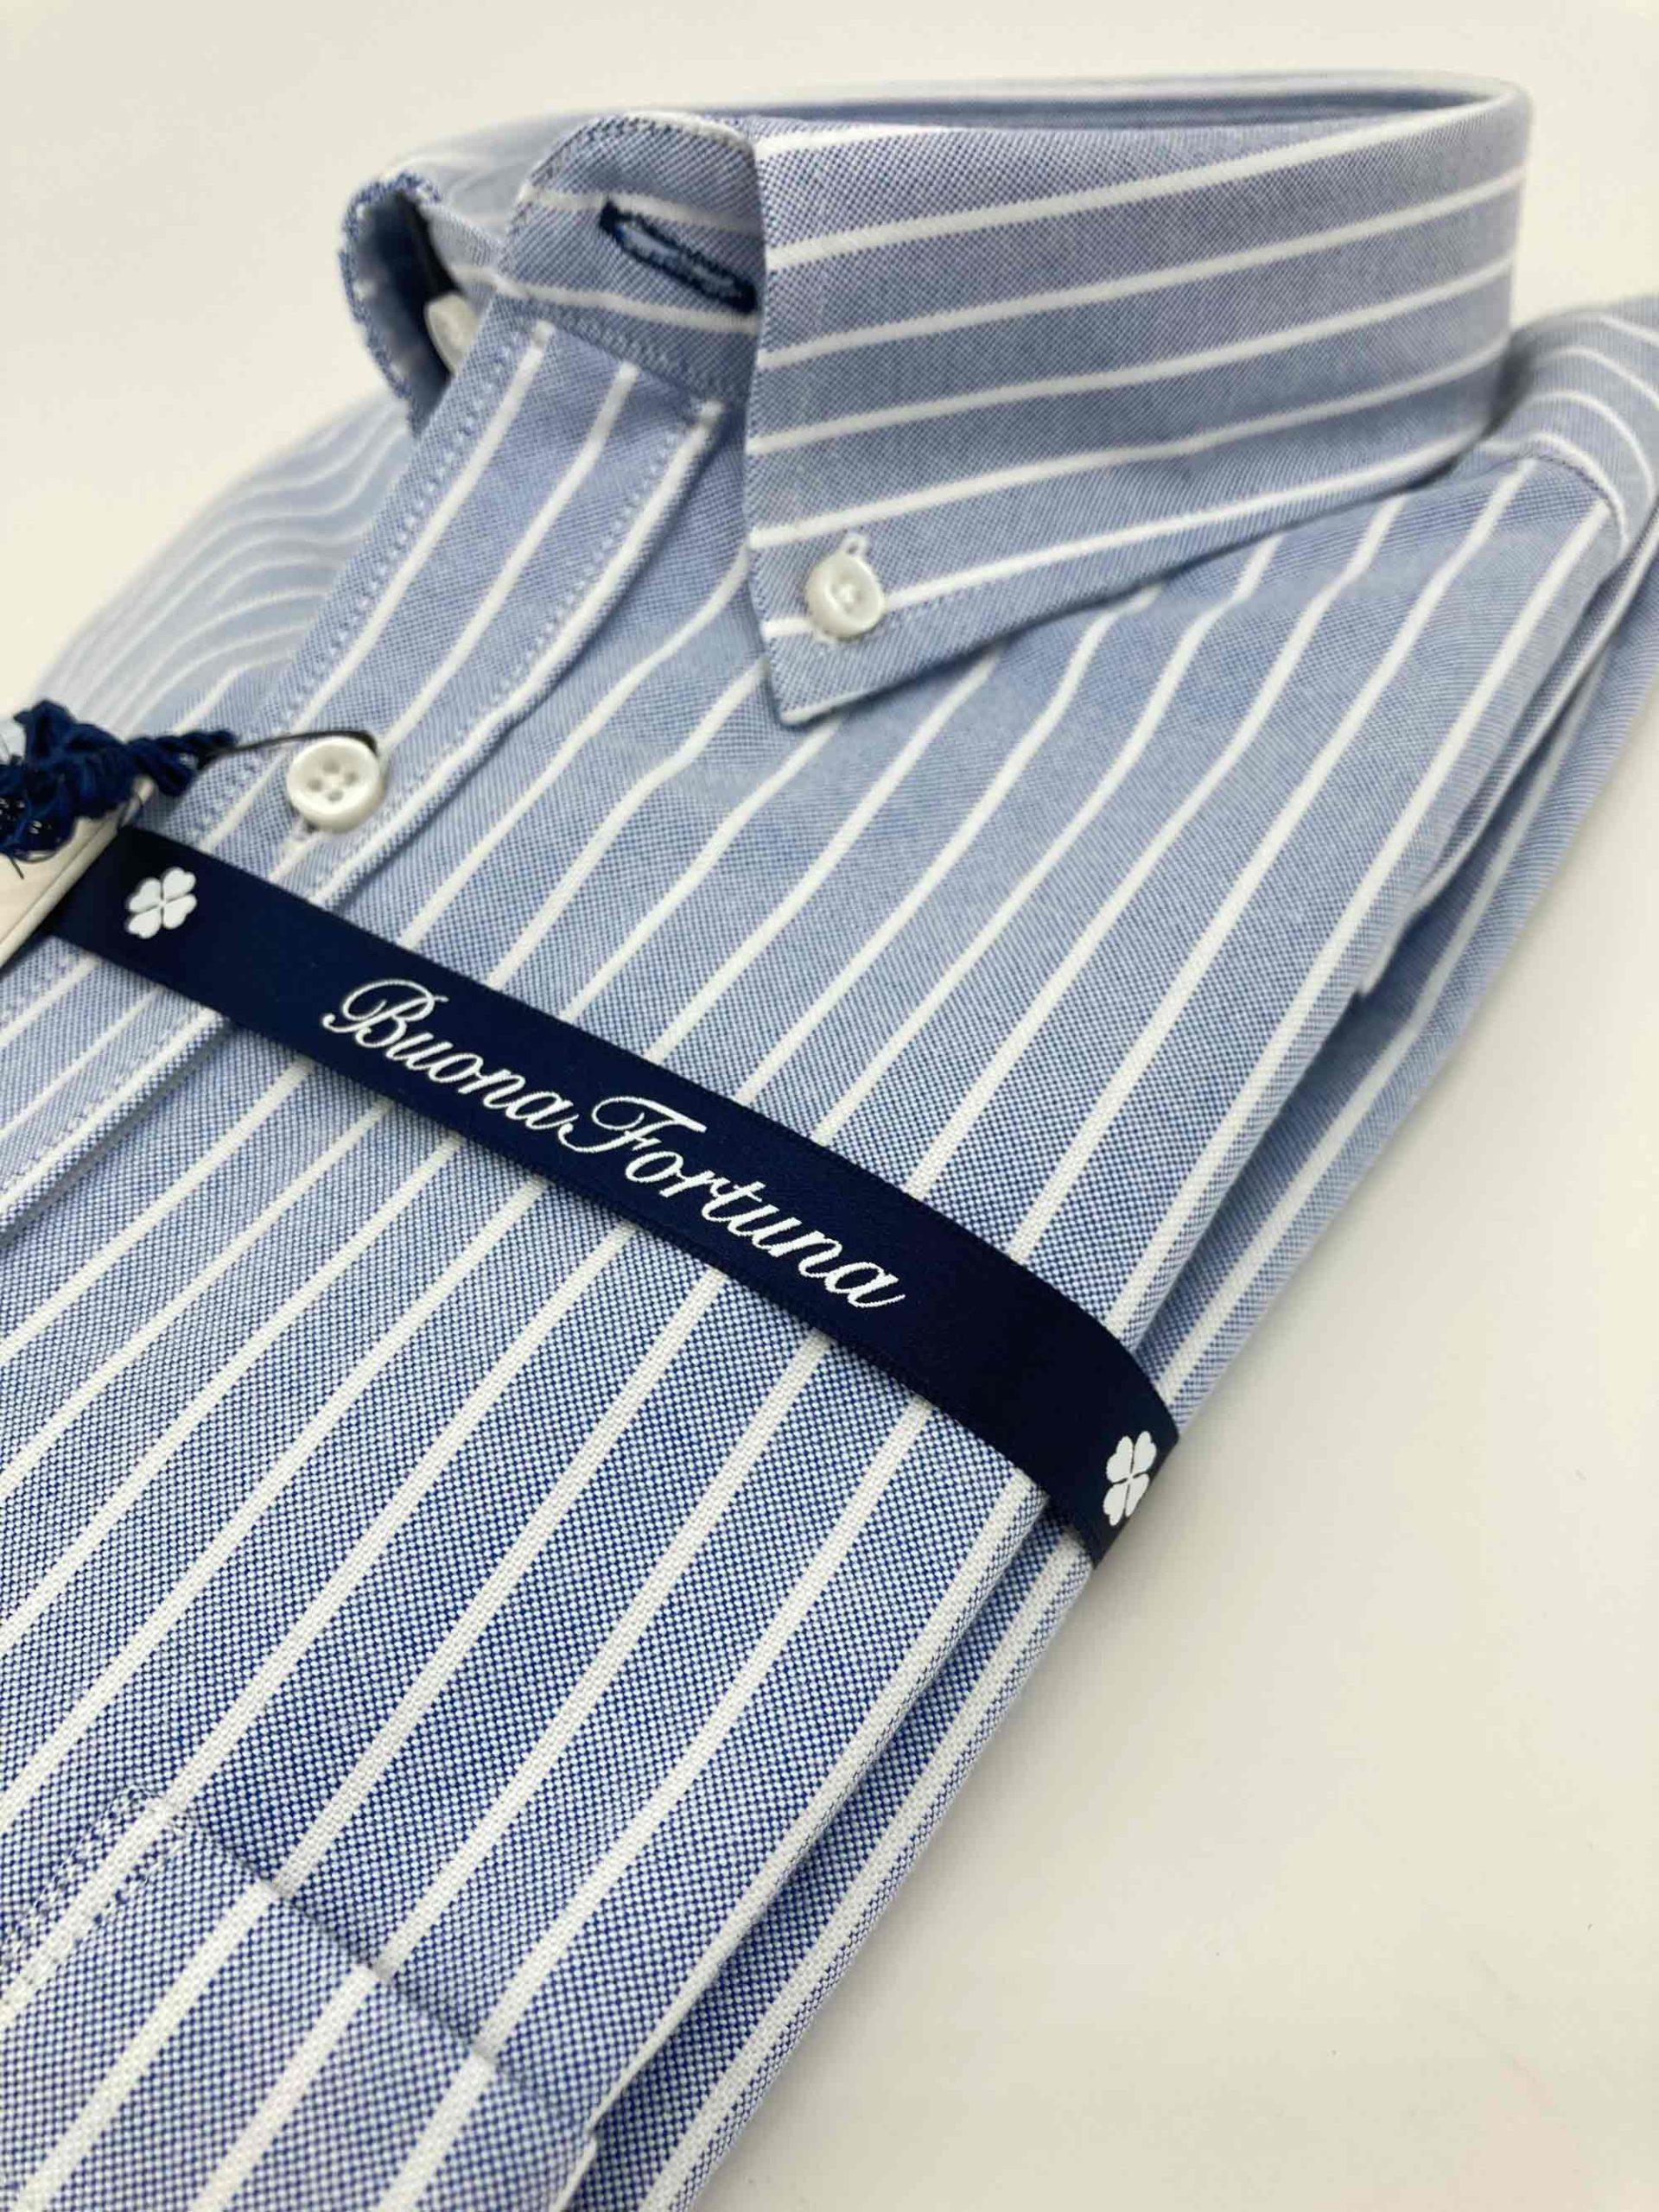 camisas buona fortuna comprar online camisas italianas exlusivas rayas oxford azul